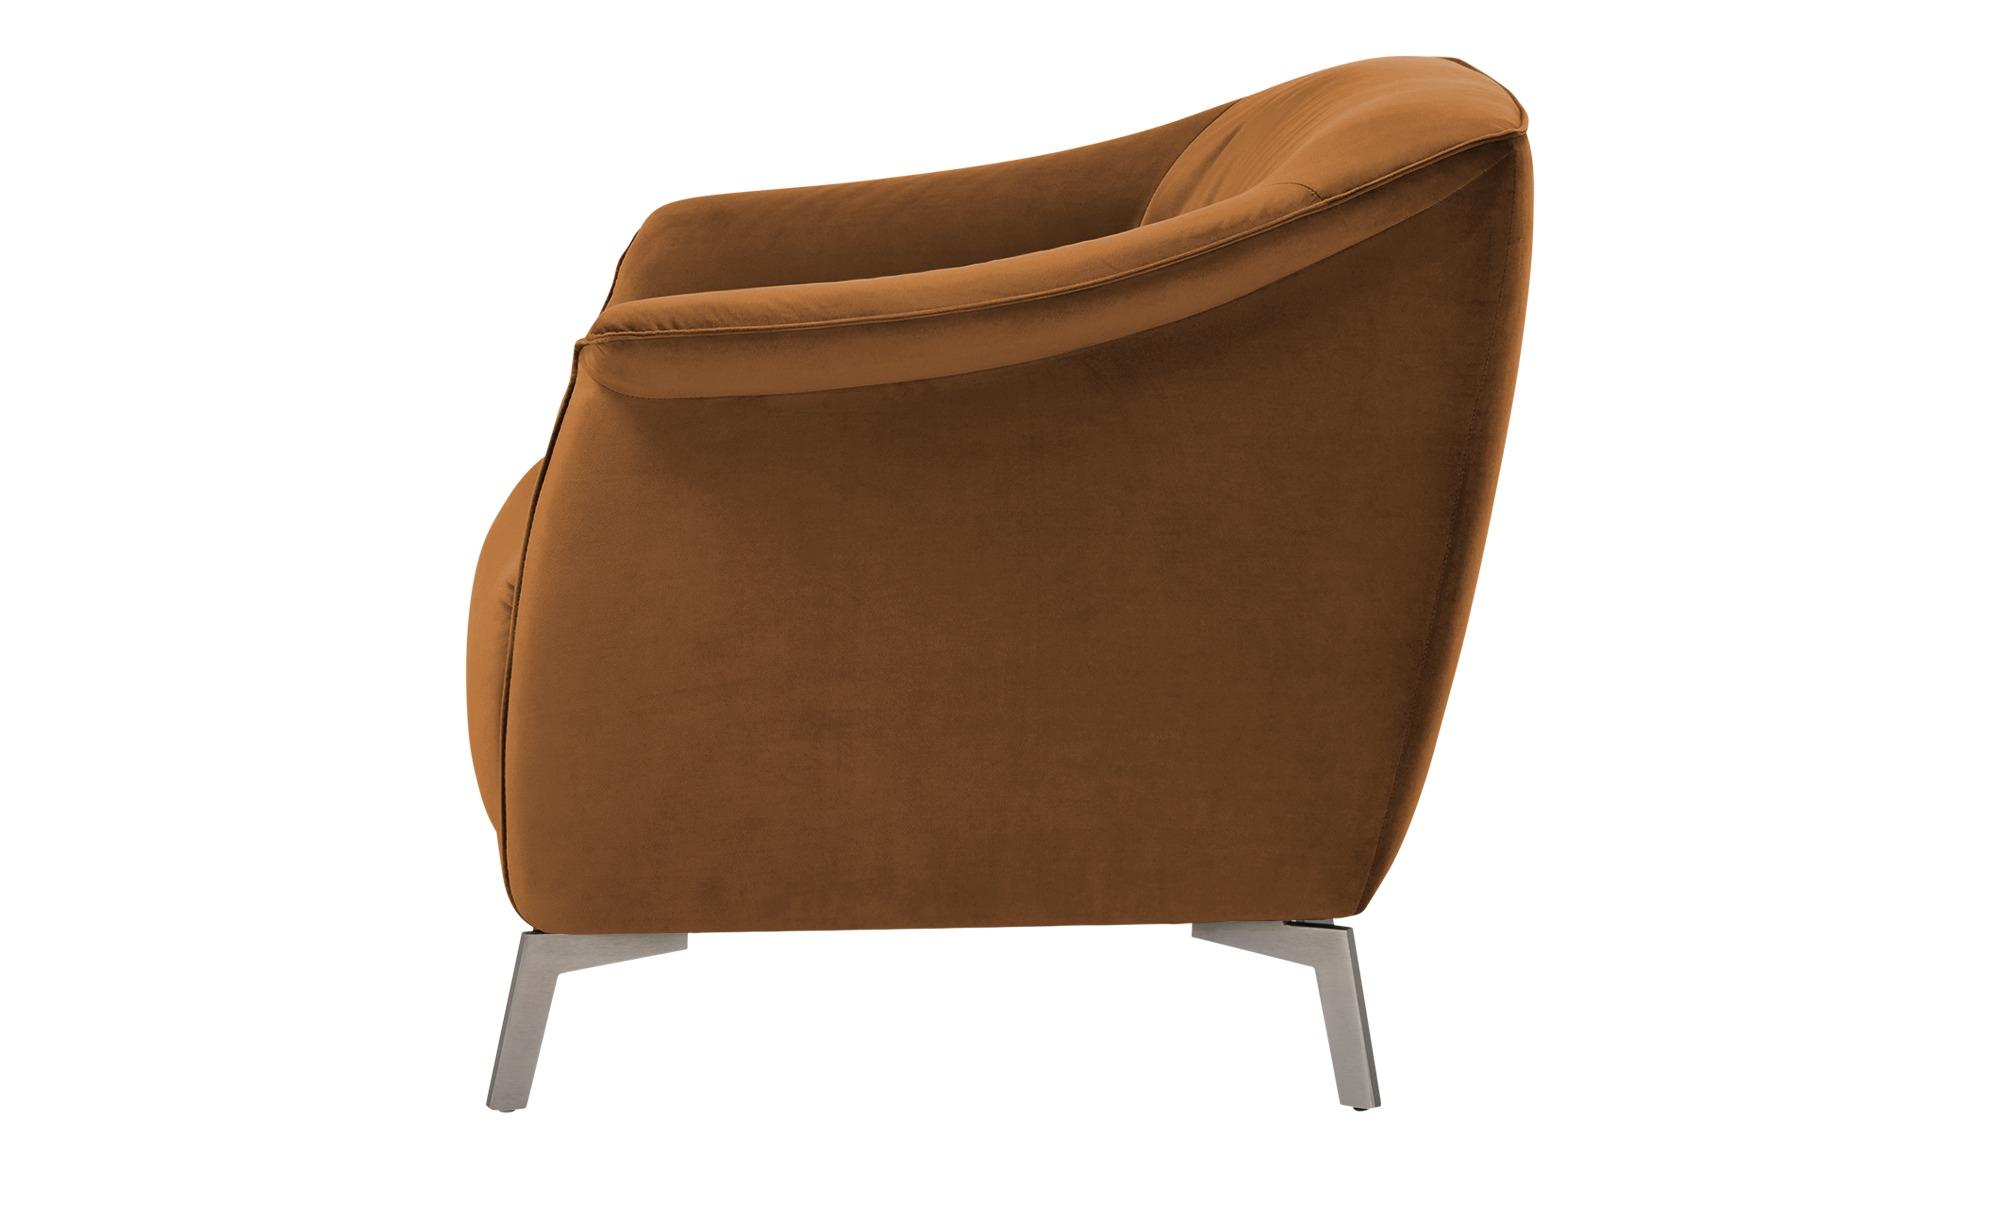 Sessel  Lamia ¦ braun ¦ Maße (cm): B: 80 H: 77 T: 83 Polstermöbel > Sessel > Polstersessel - Höffner